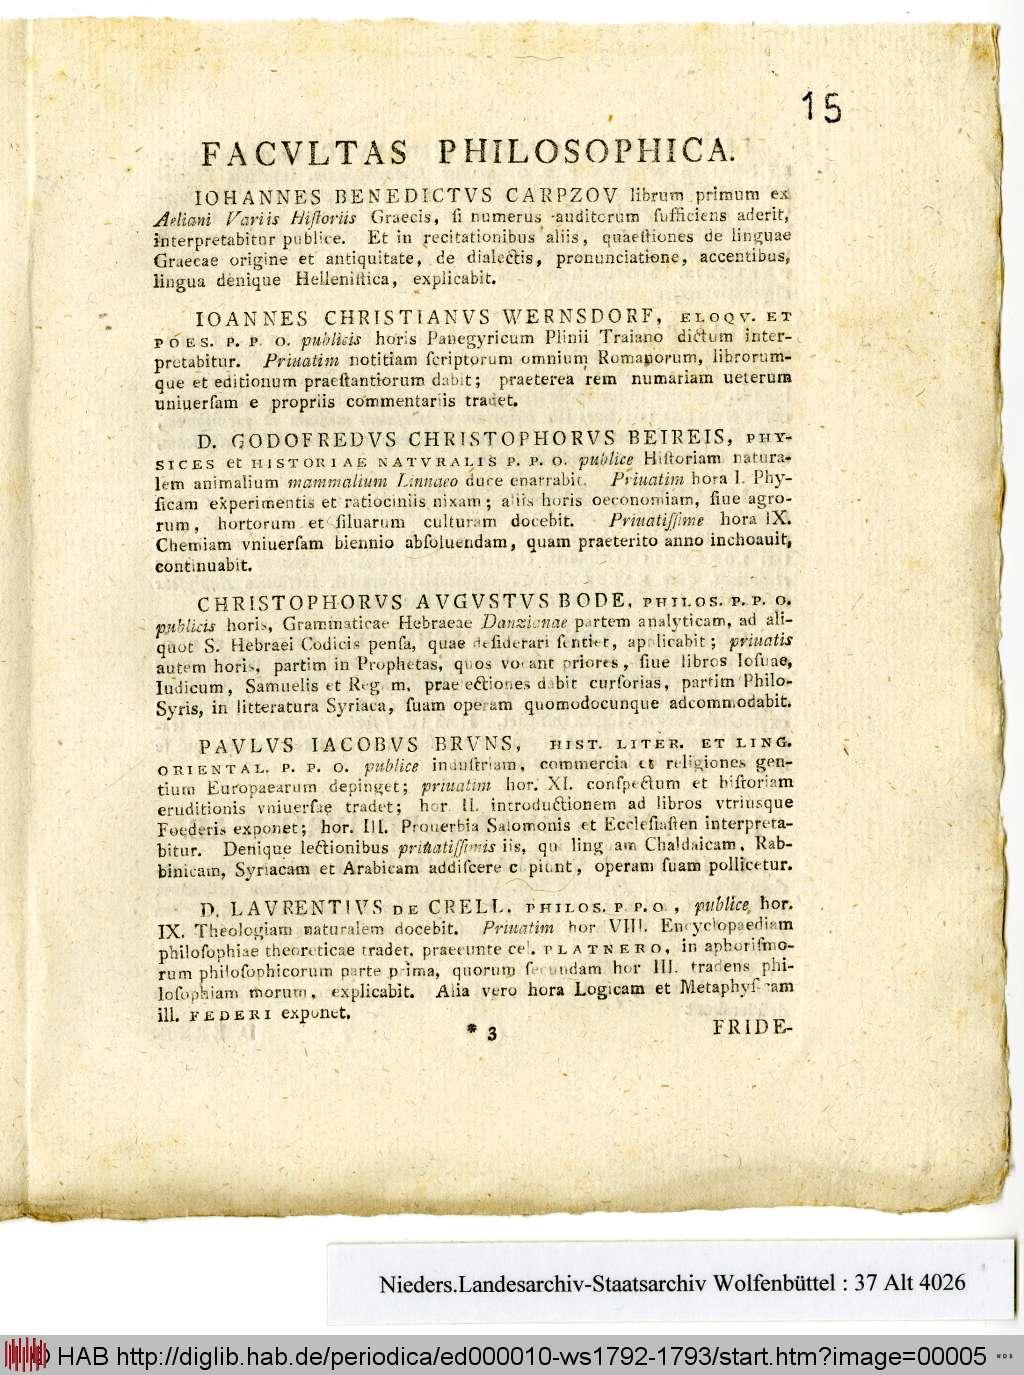 http://diglib.hab.de/periodica/ed000010-ws1792-1793/00005.jpg